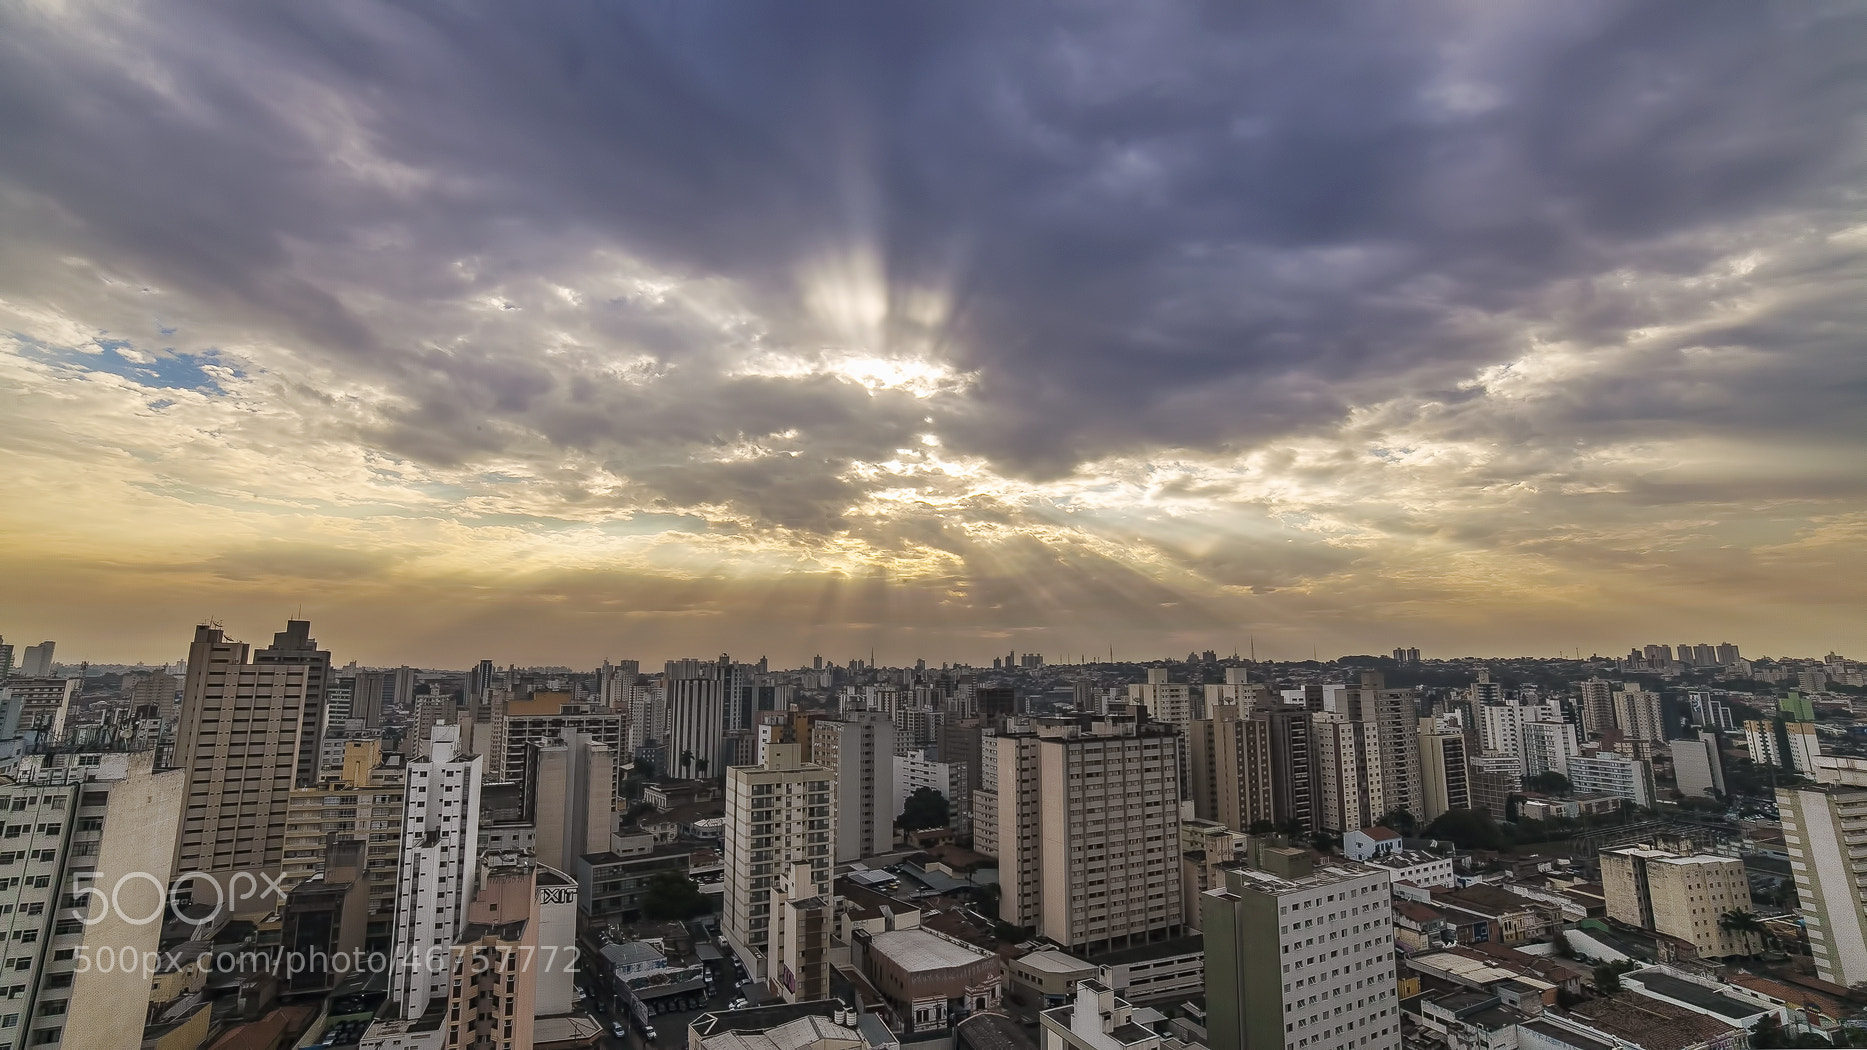 Photograph Campinas city by Rafael Defavari on 500px